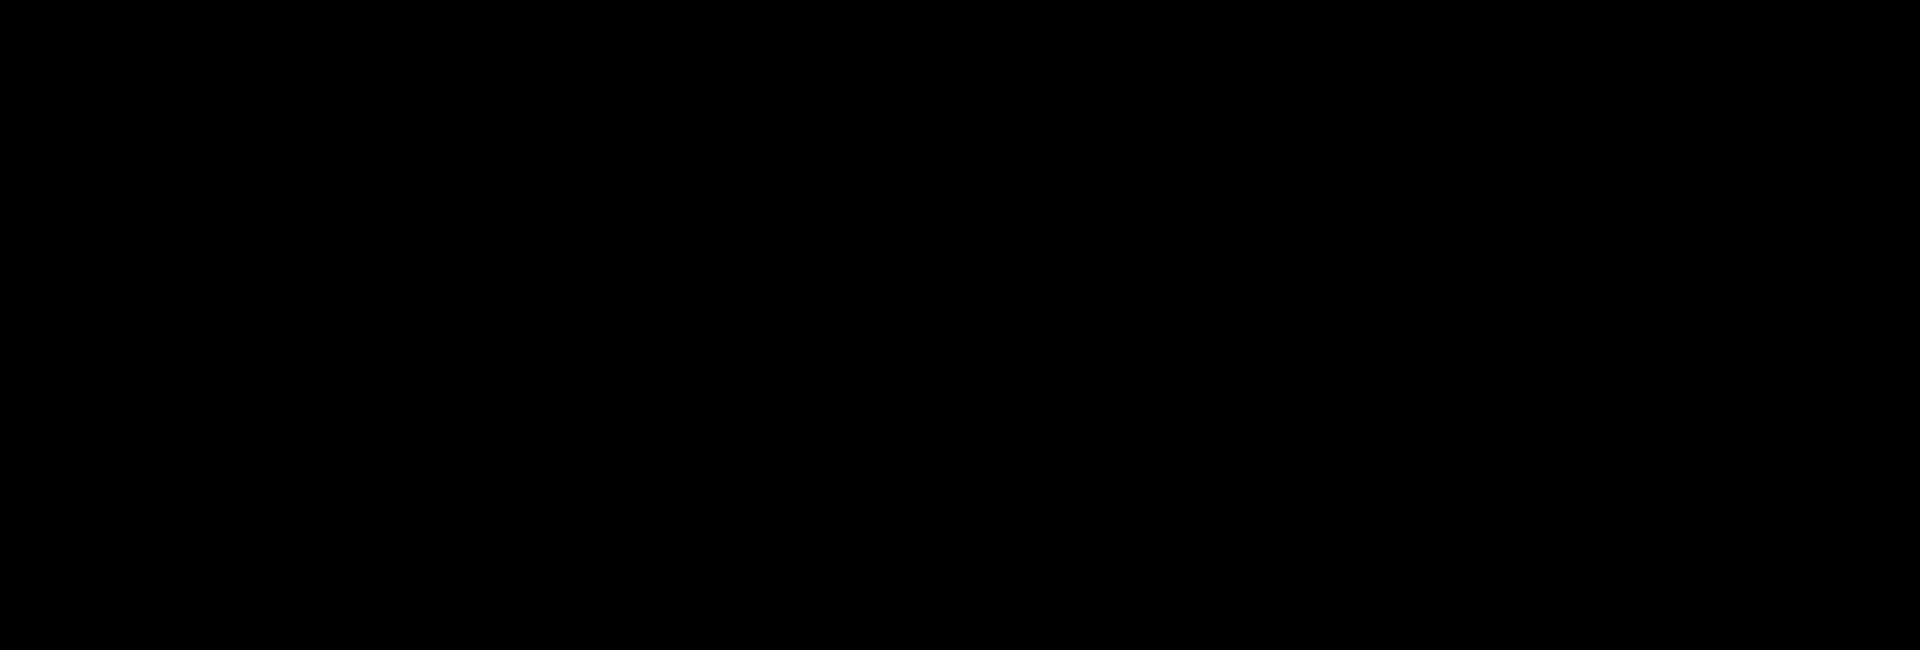 bg-021